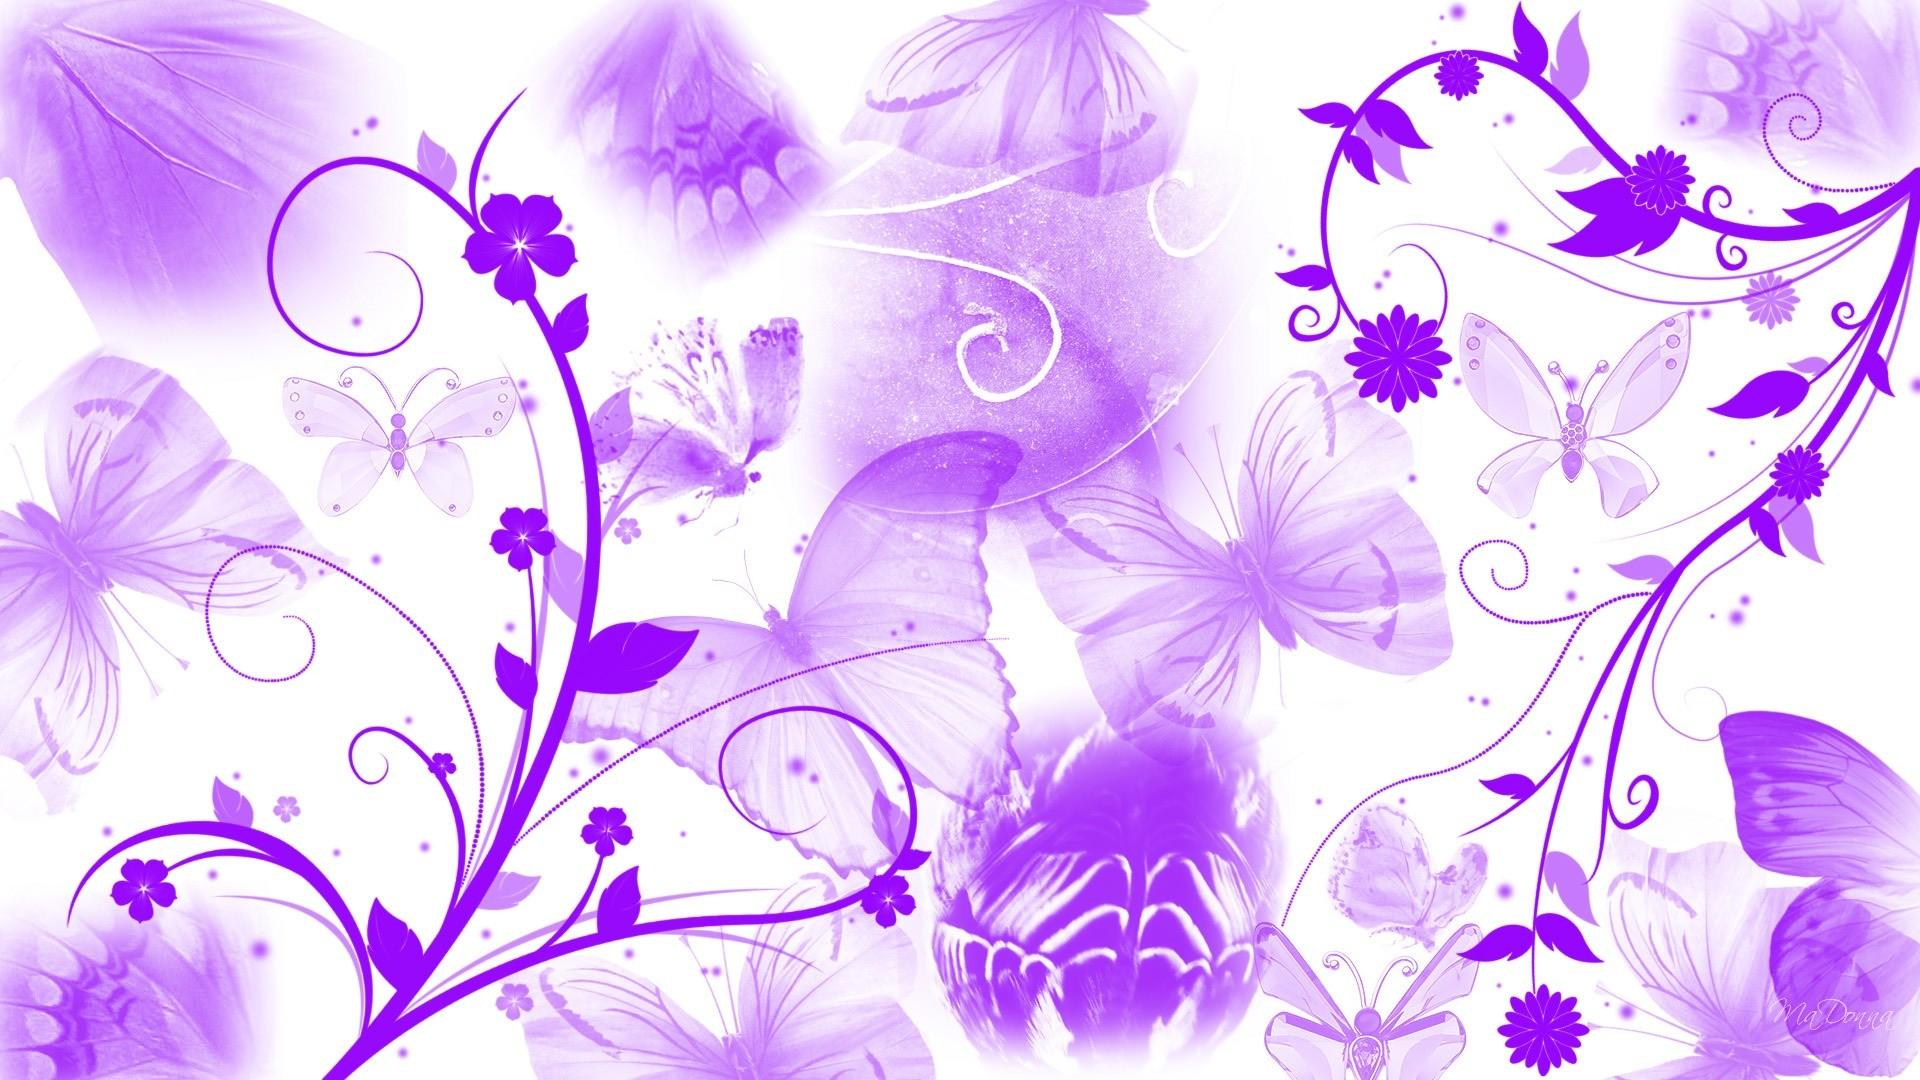 Res: 1920x1080, Purple Butterfly Wallpaper